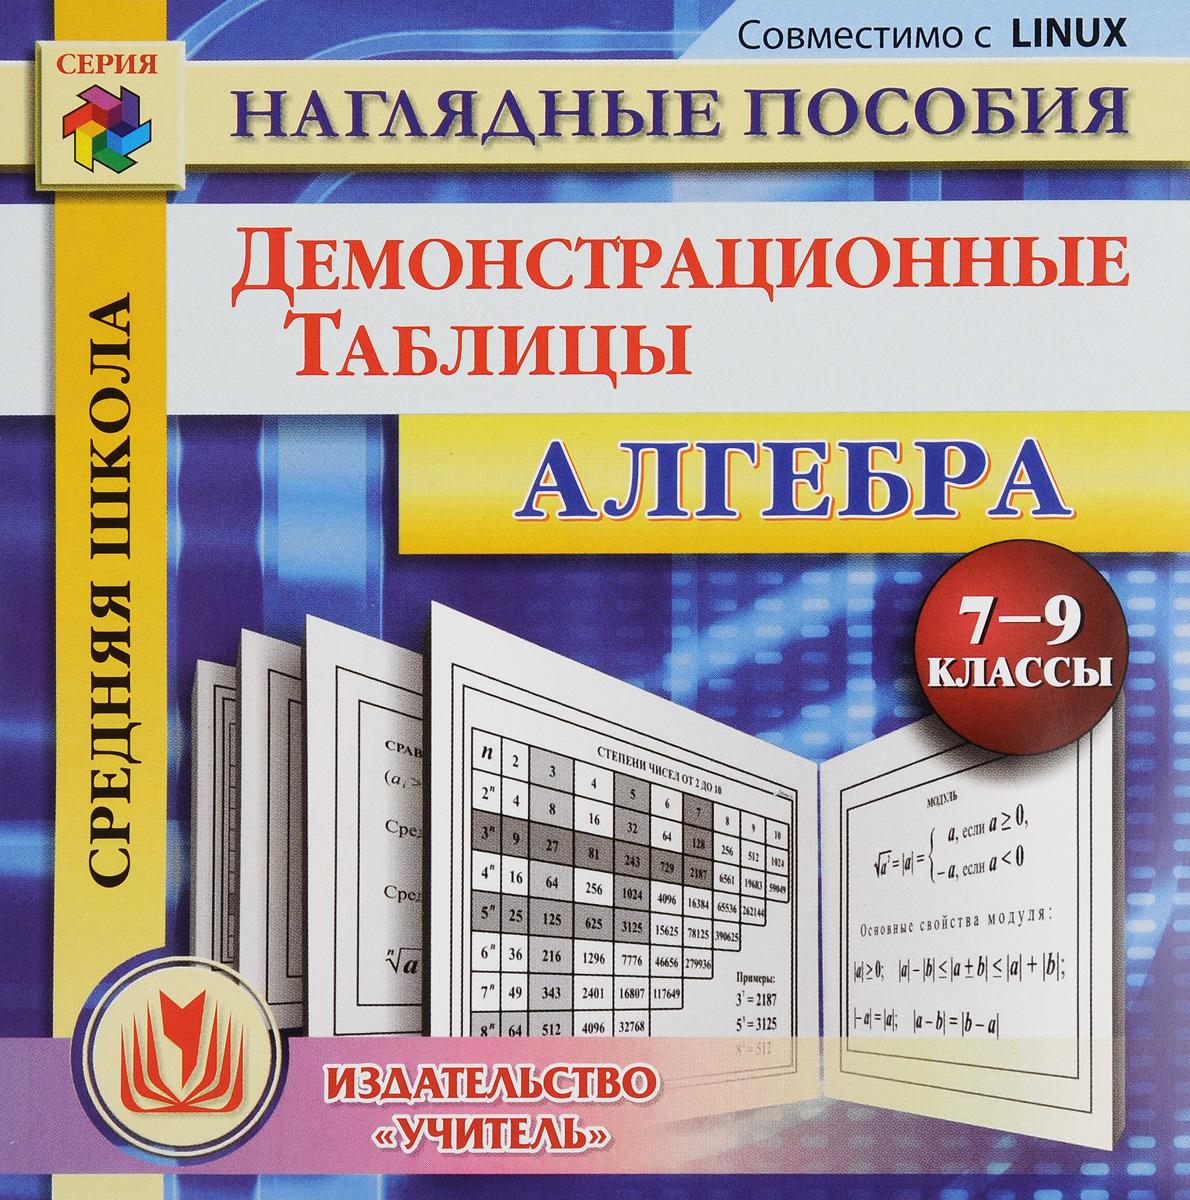 Алгебра. 7-9 классы. Демонстрационные таблицы